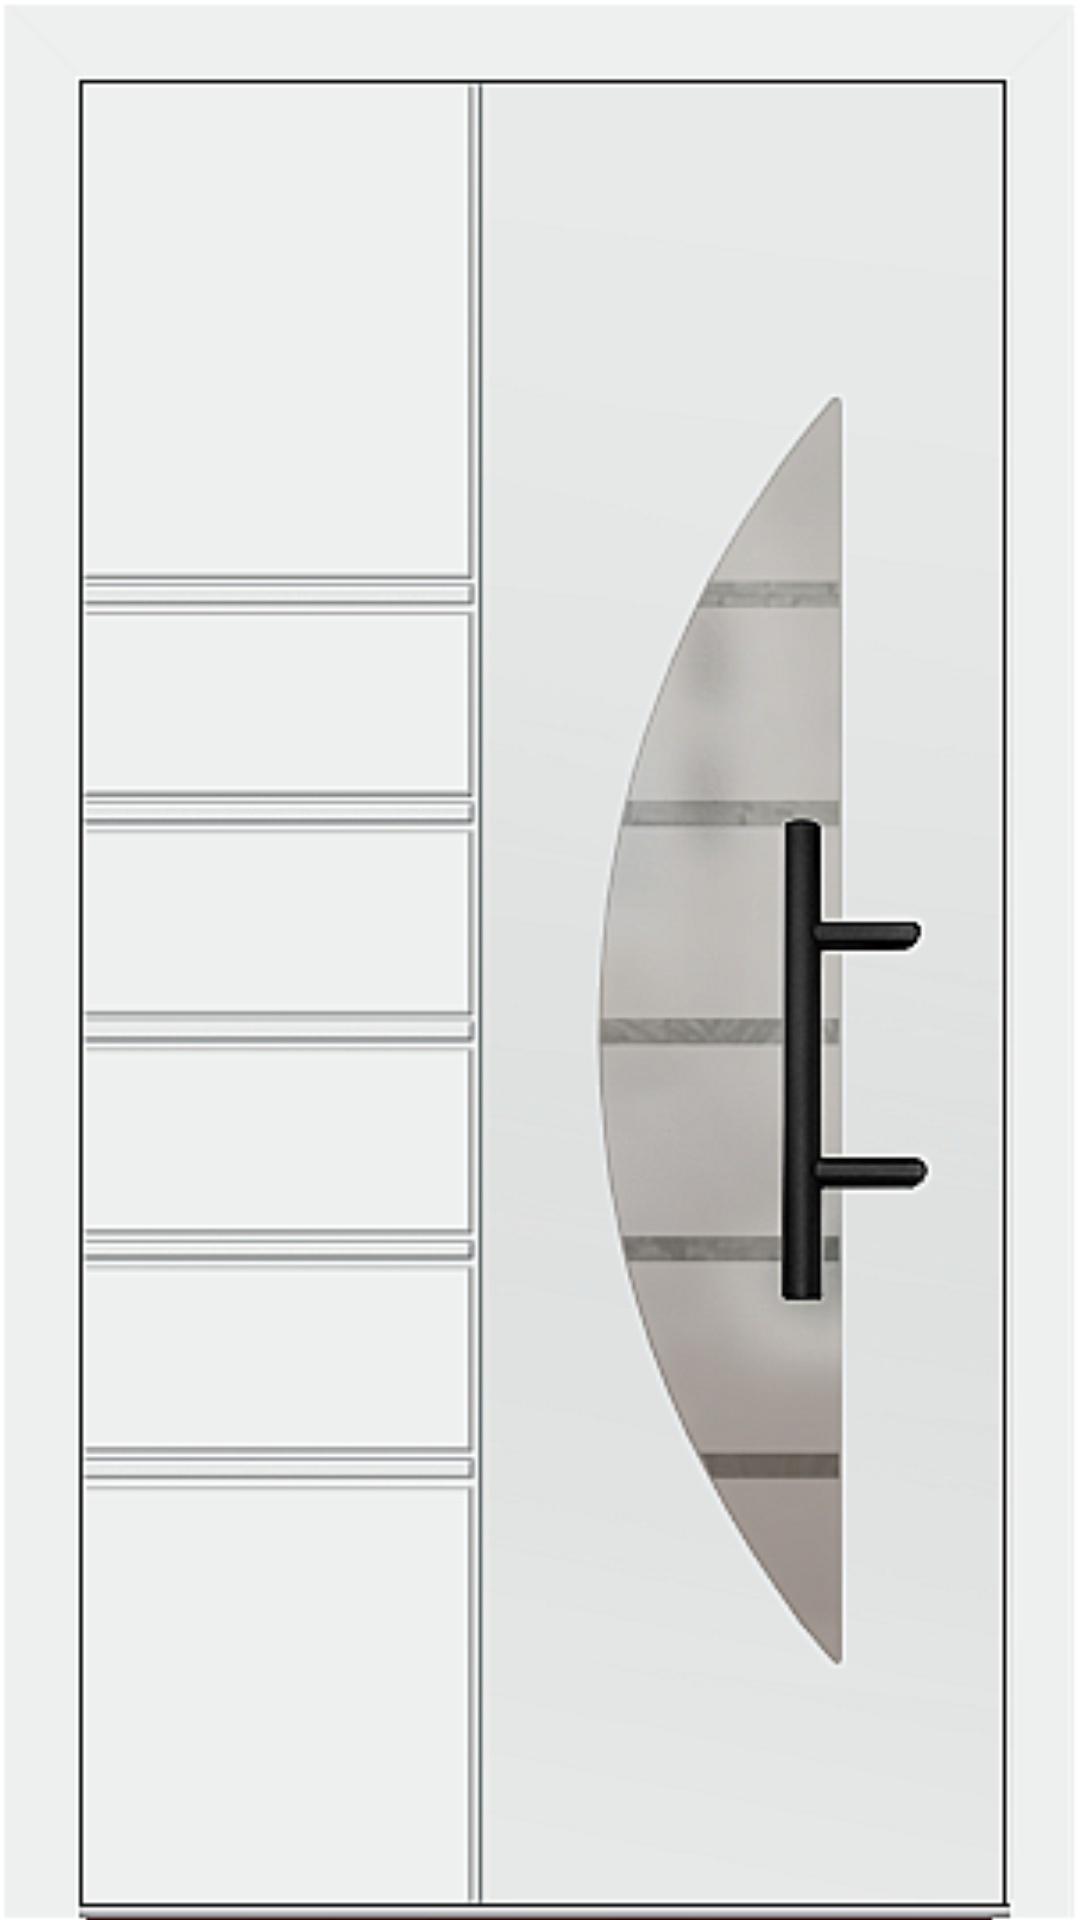 Holz-Alu Haustür Modell 66514 weiß